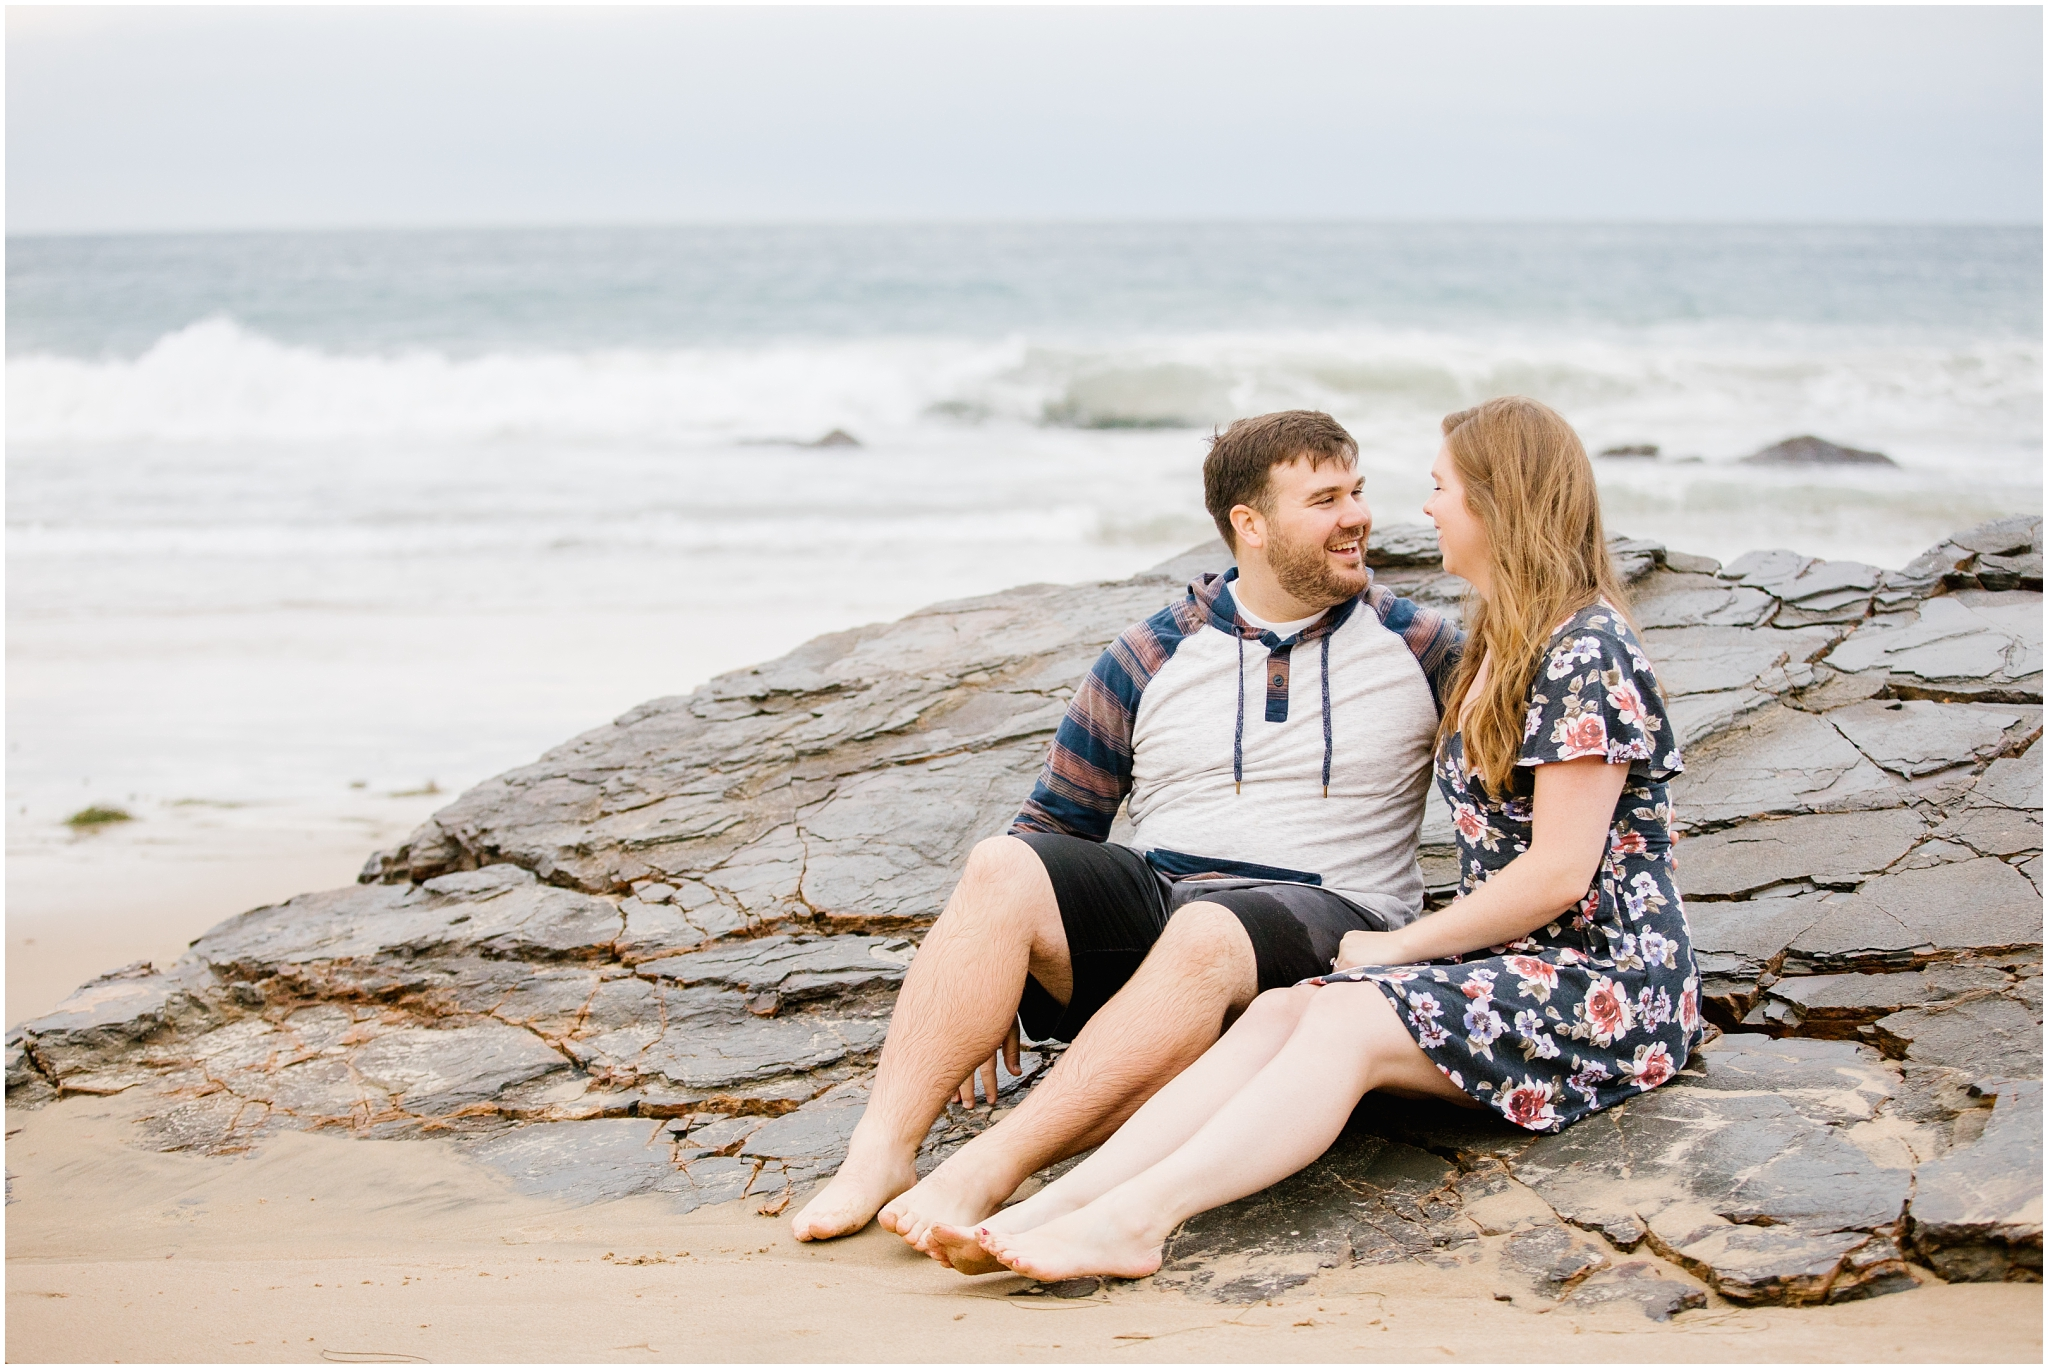 CassandraNathan-27E_Lizzie-B-Imagery-California-Wedding-Photographer-Orange-County-Utah-Park-City-Engagement-Session.jpg